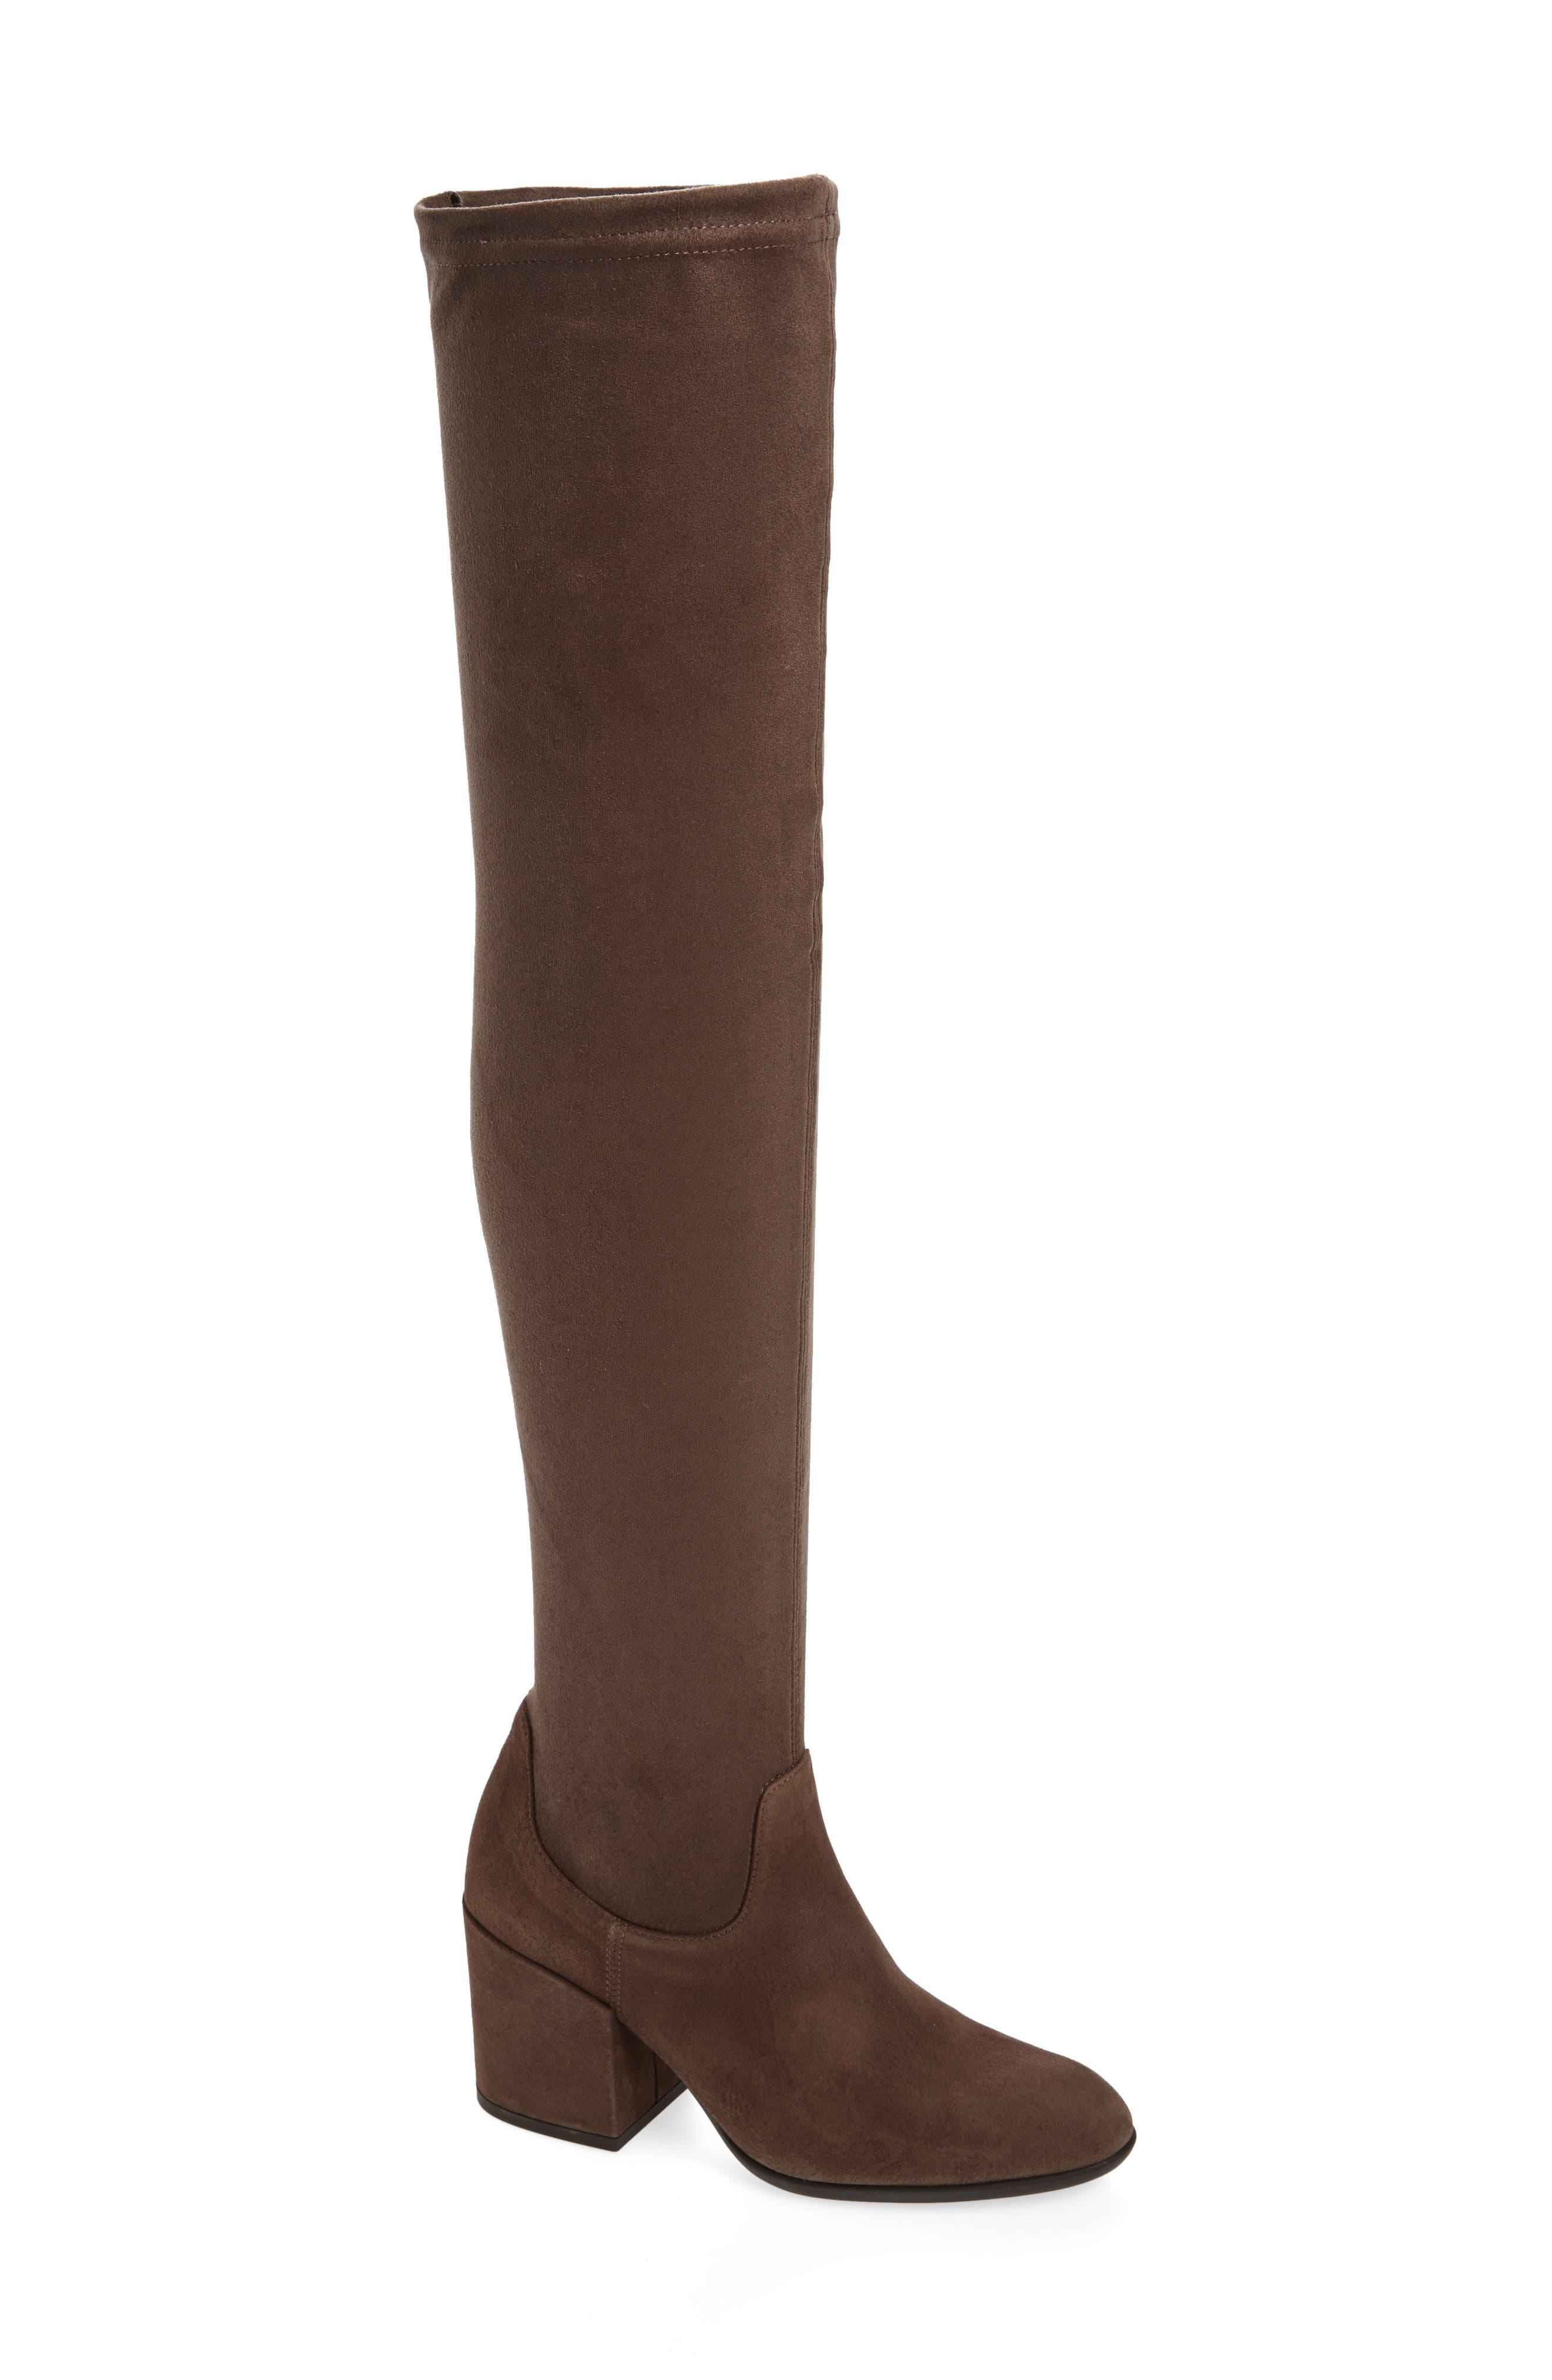 Alternate Image 1 Selected - Sesto Meucci Verve Over the Knee Boot (Women)